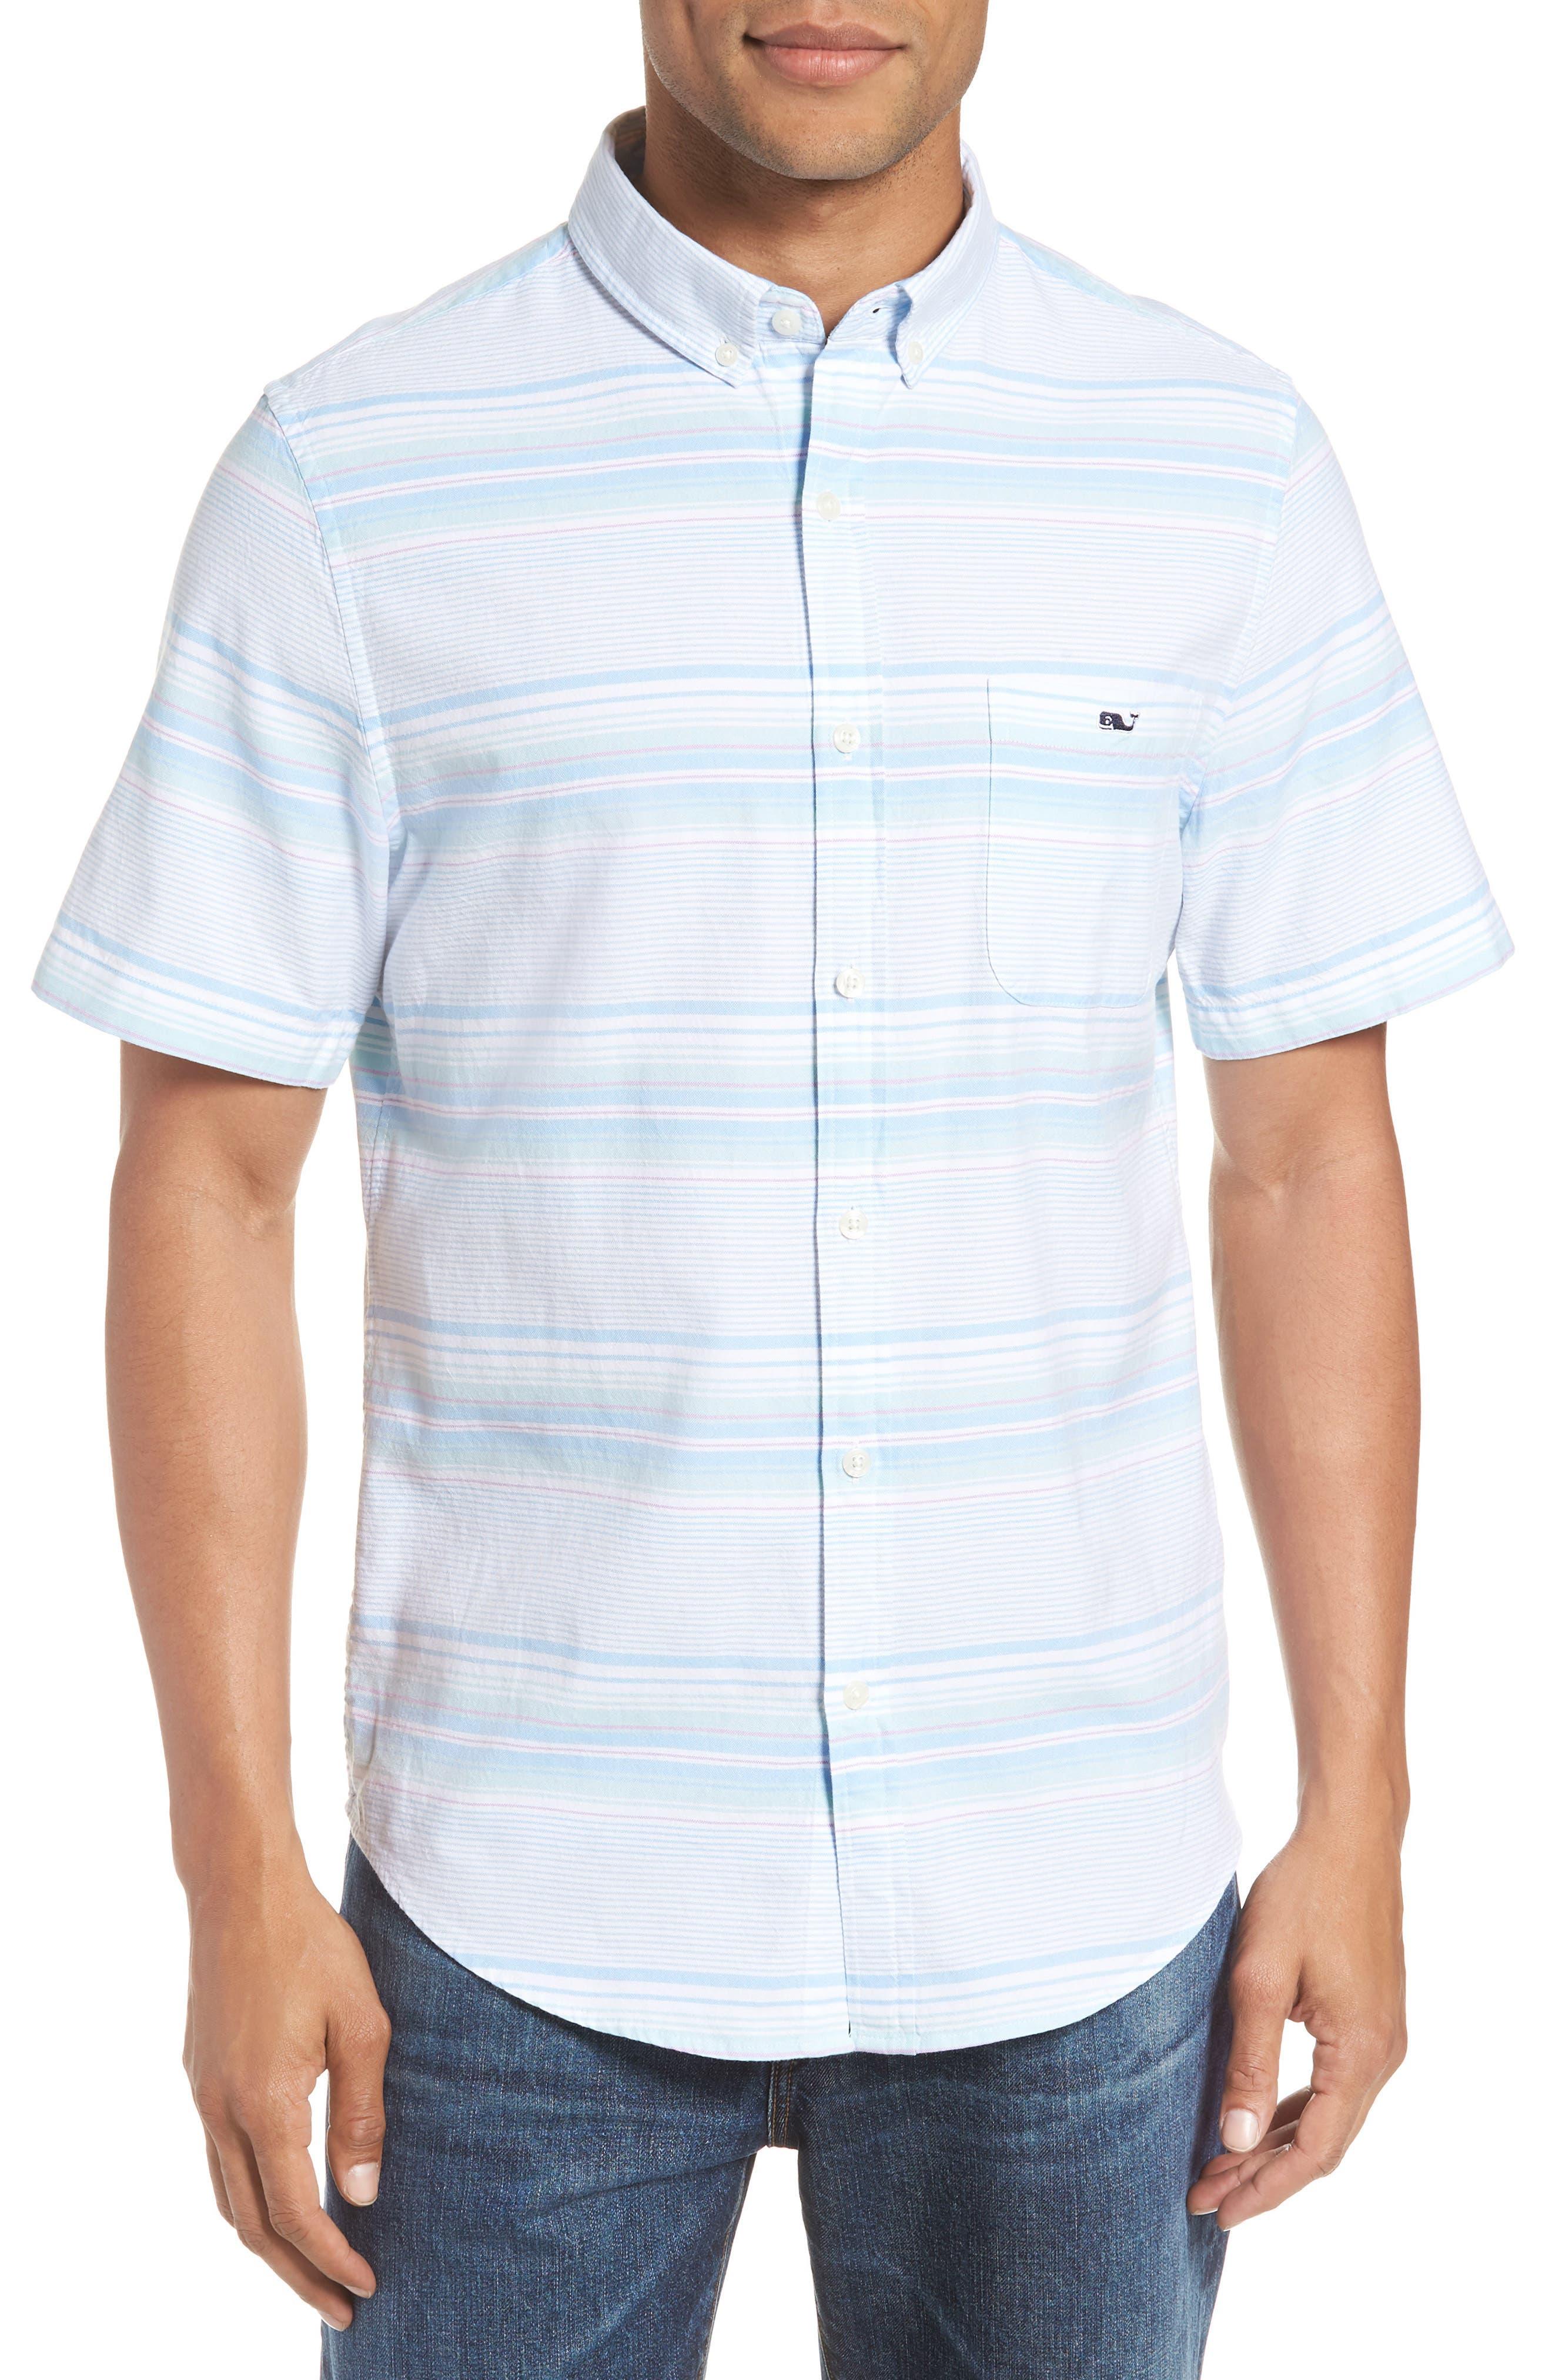 Sand Piper Tucker Regular Fit Stripe Oxford Sport Shirt,                             Main thumbnail 1, color,                             POOL SIDE